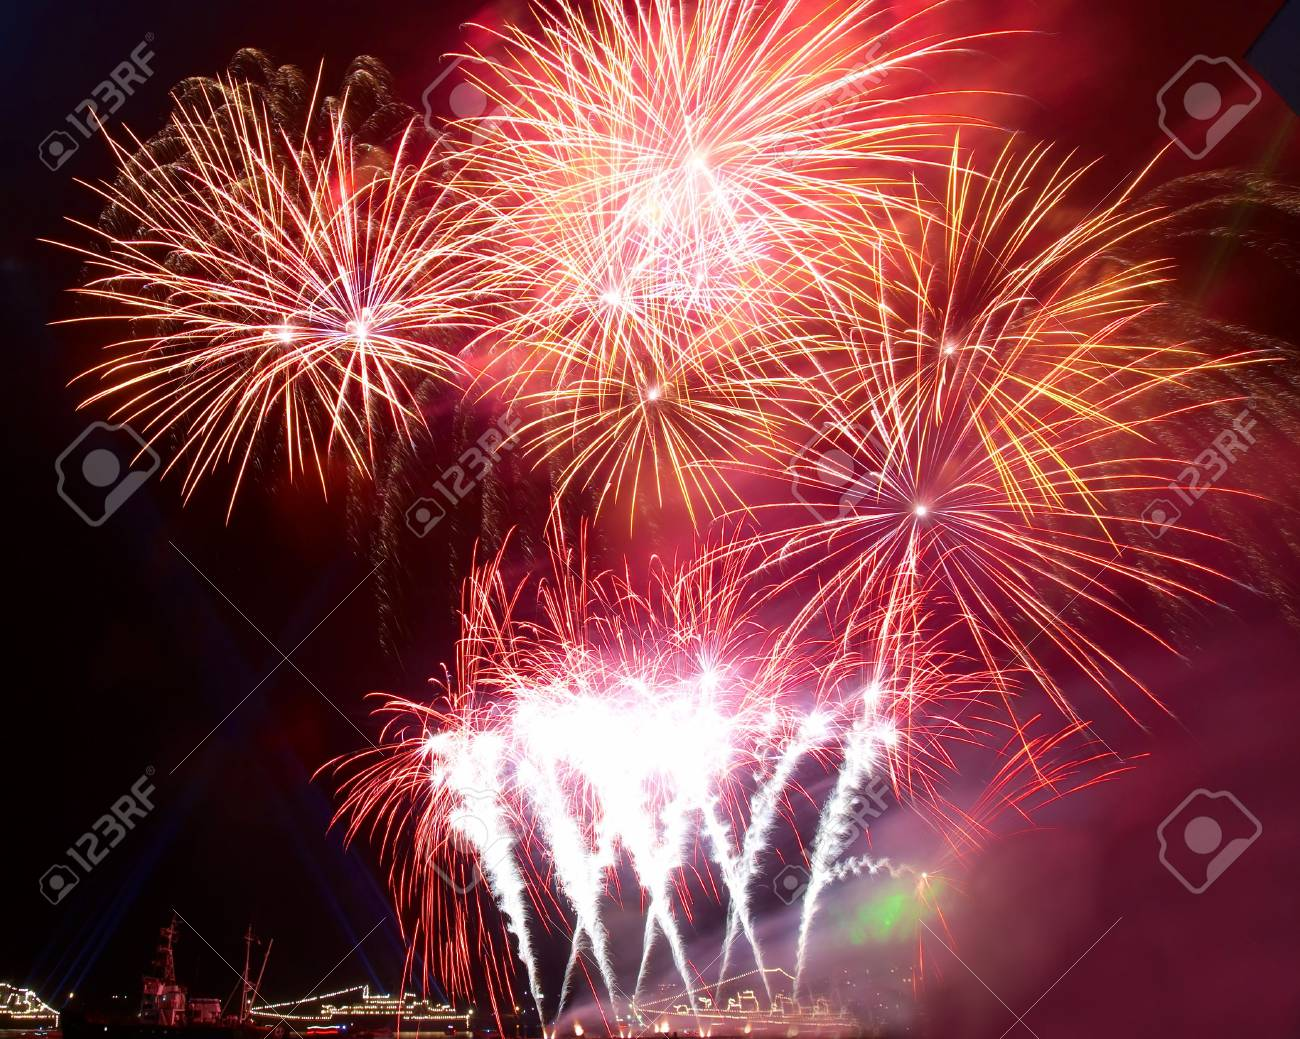 Salute, fireworks above the bay. Sevastopol, Ukraine. - 3762056